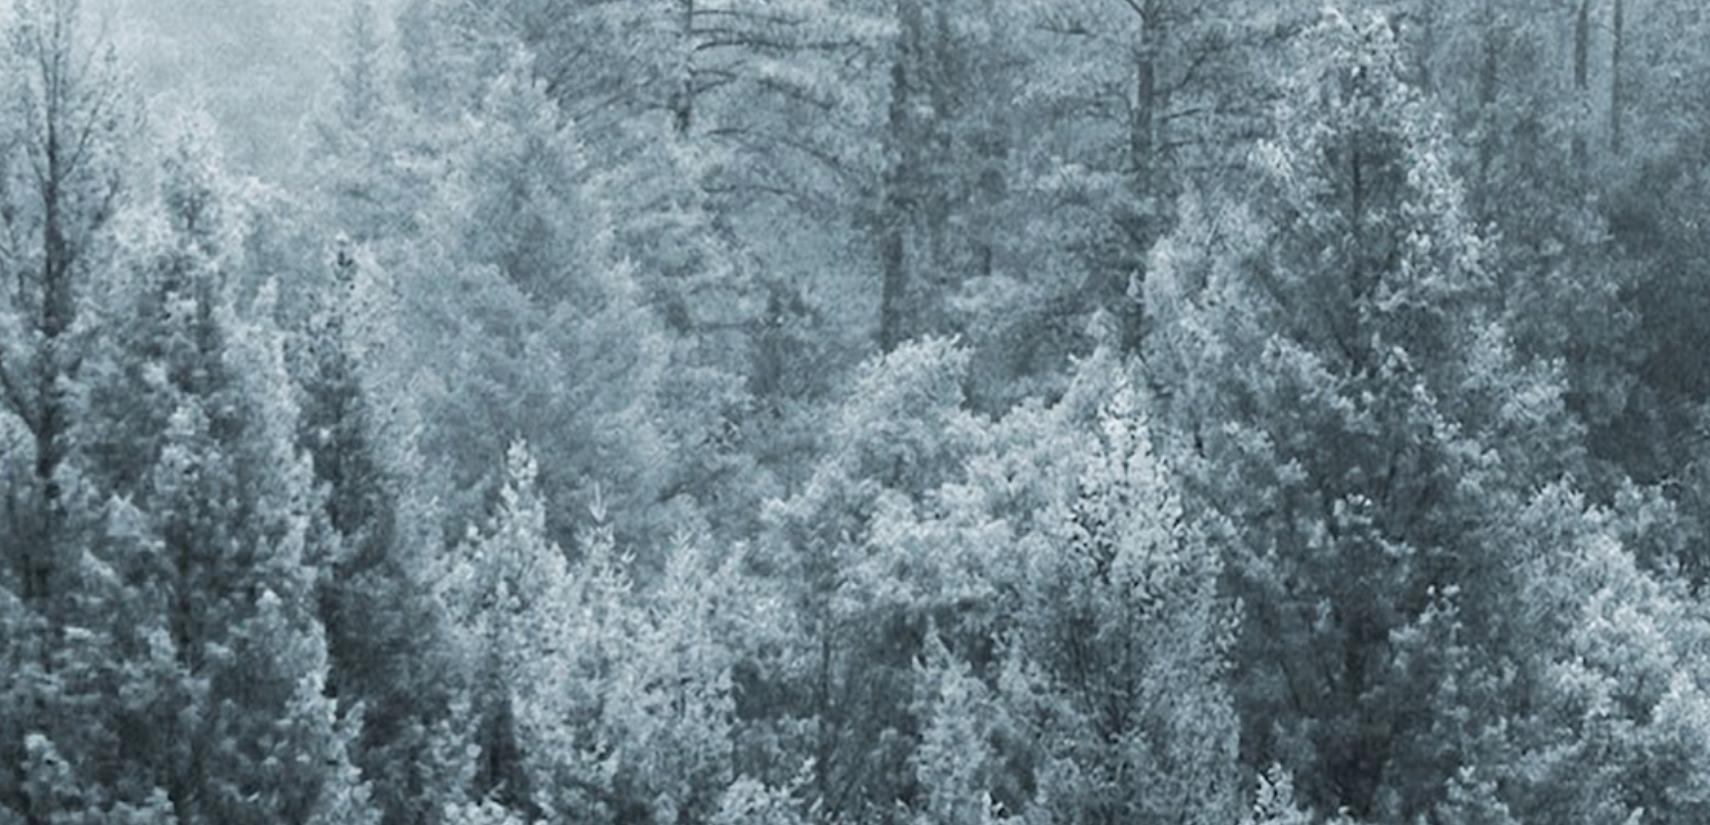 TMU - Modularer Holzbodenbaukasten